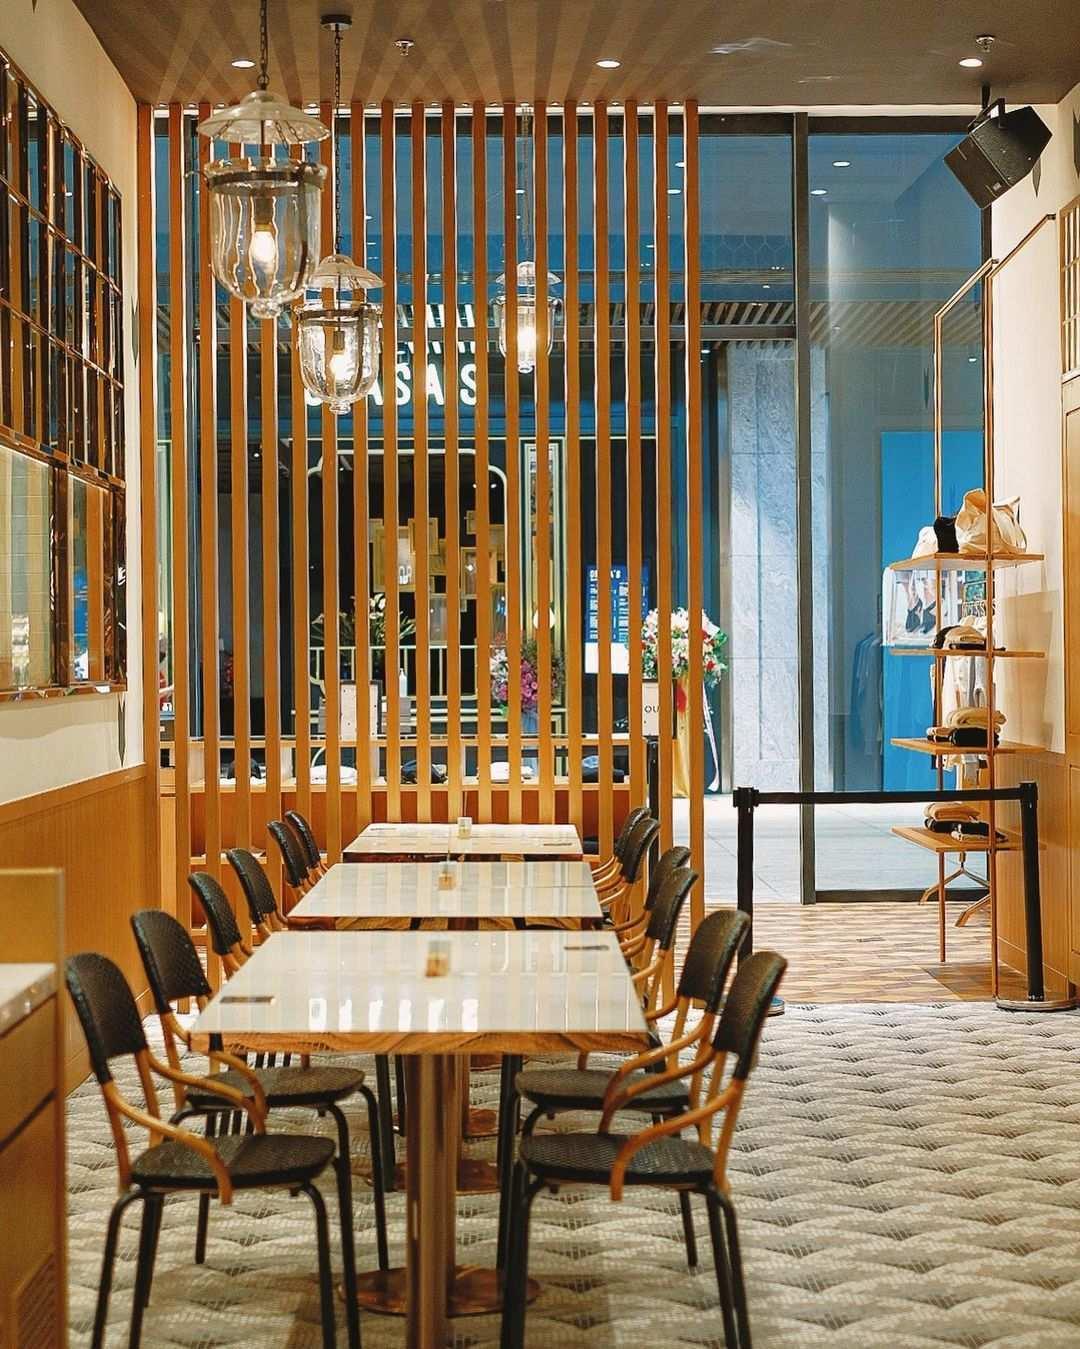 Spot Tempat di Cafe Kitsune SCBD Image From @echasyahrir